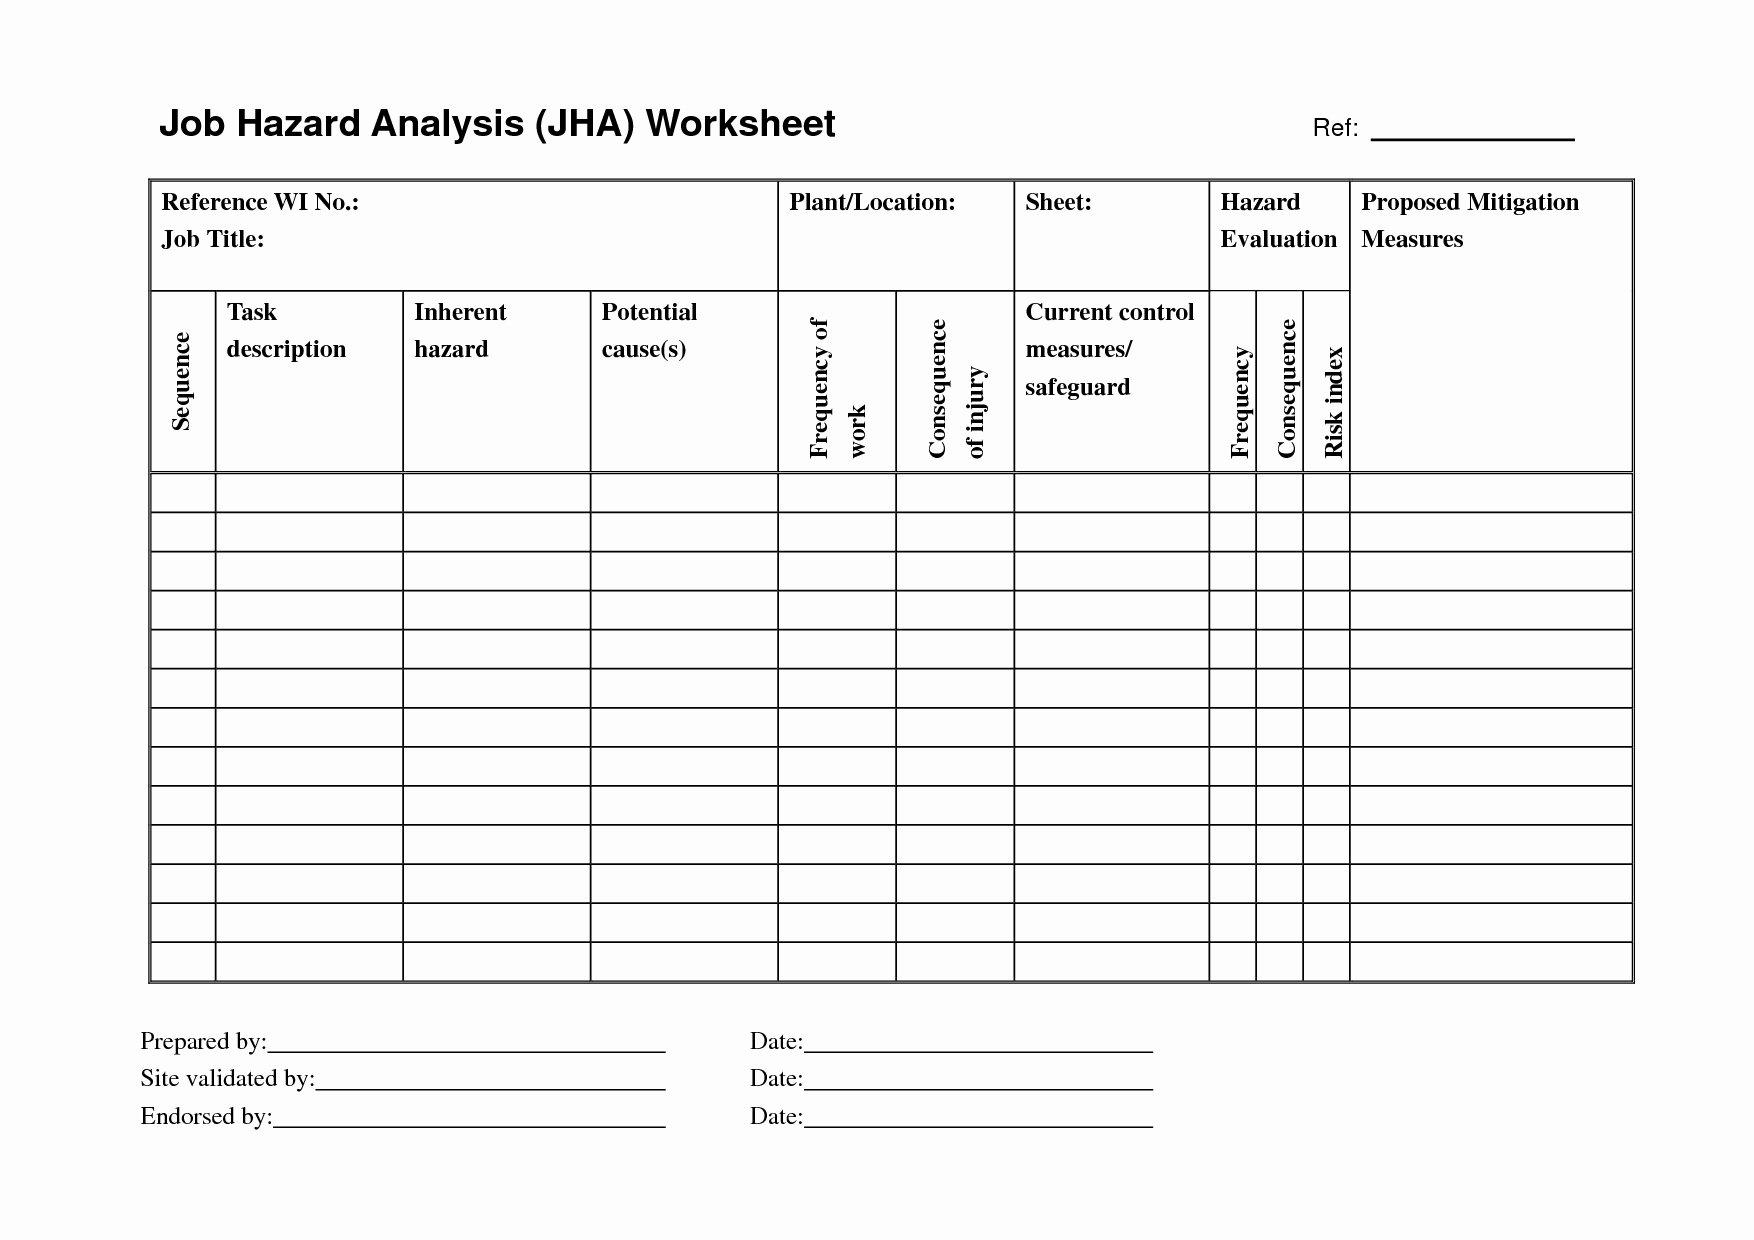 Worksheet Hazard Analysis Worksheet Grass Fedjp